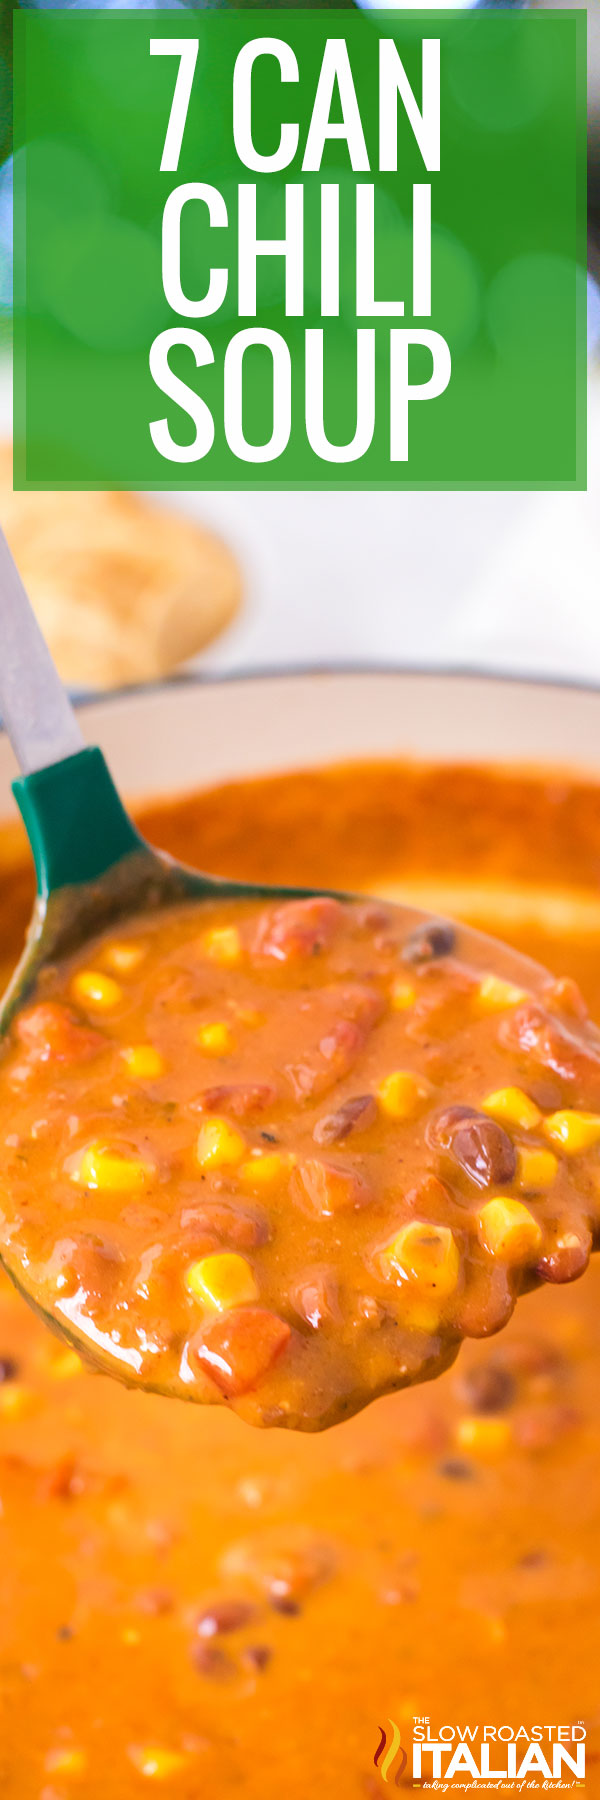 close up of a ladle of soup